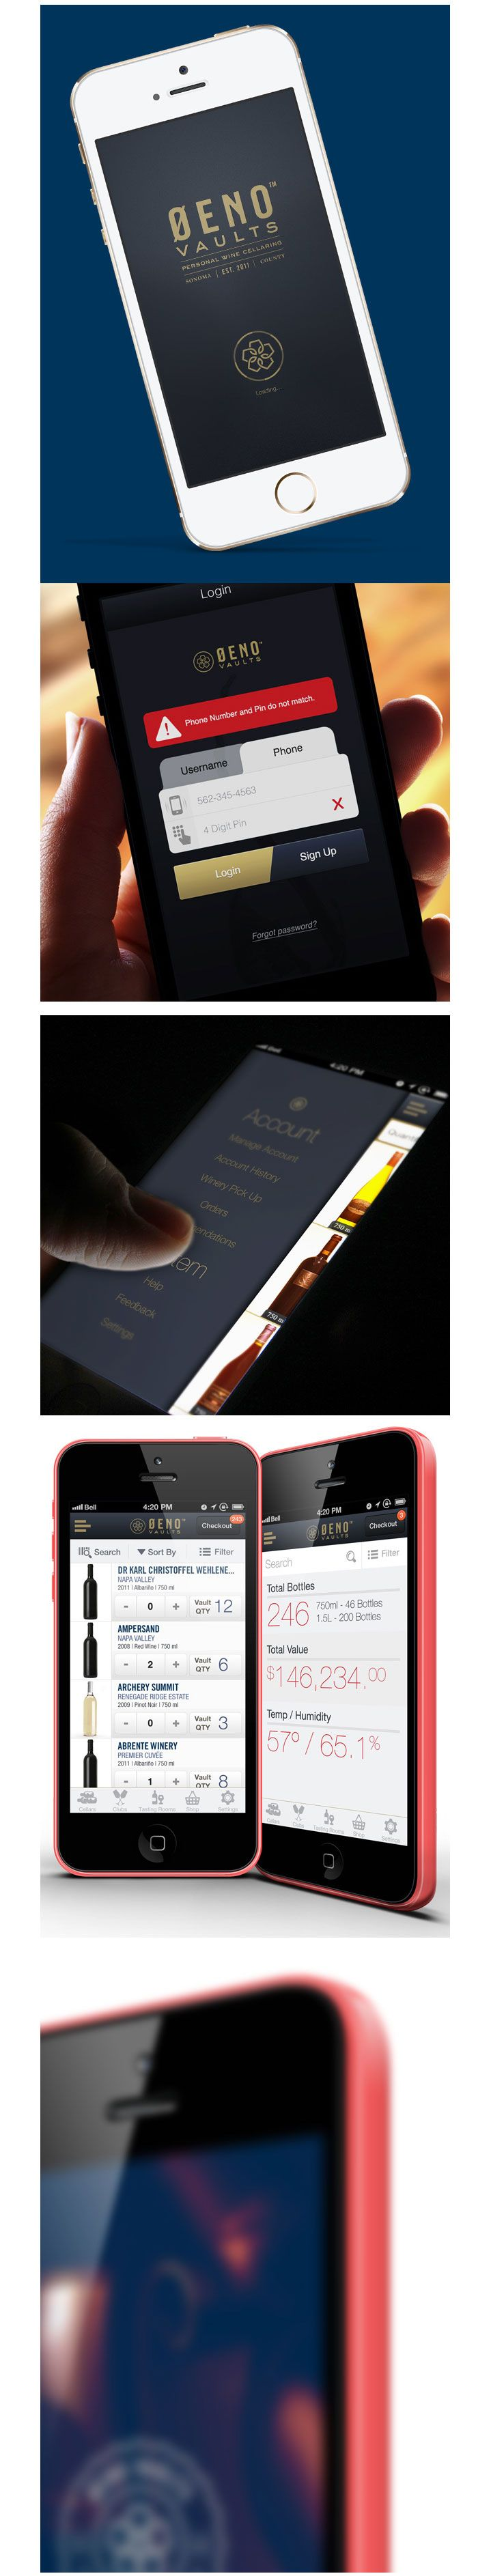 Oeno Vaults App |  #appdesign #interface #design